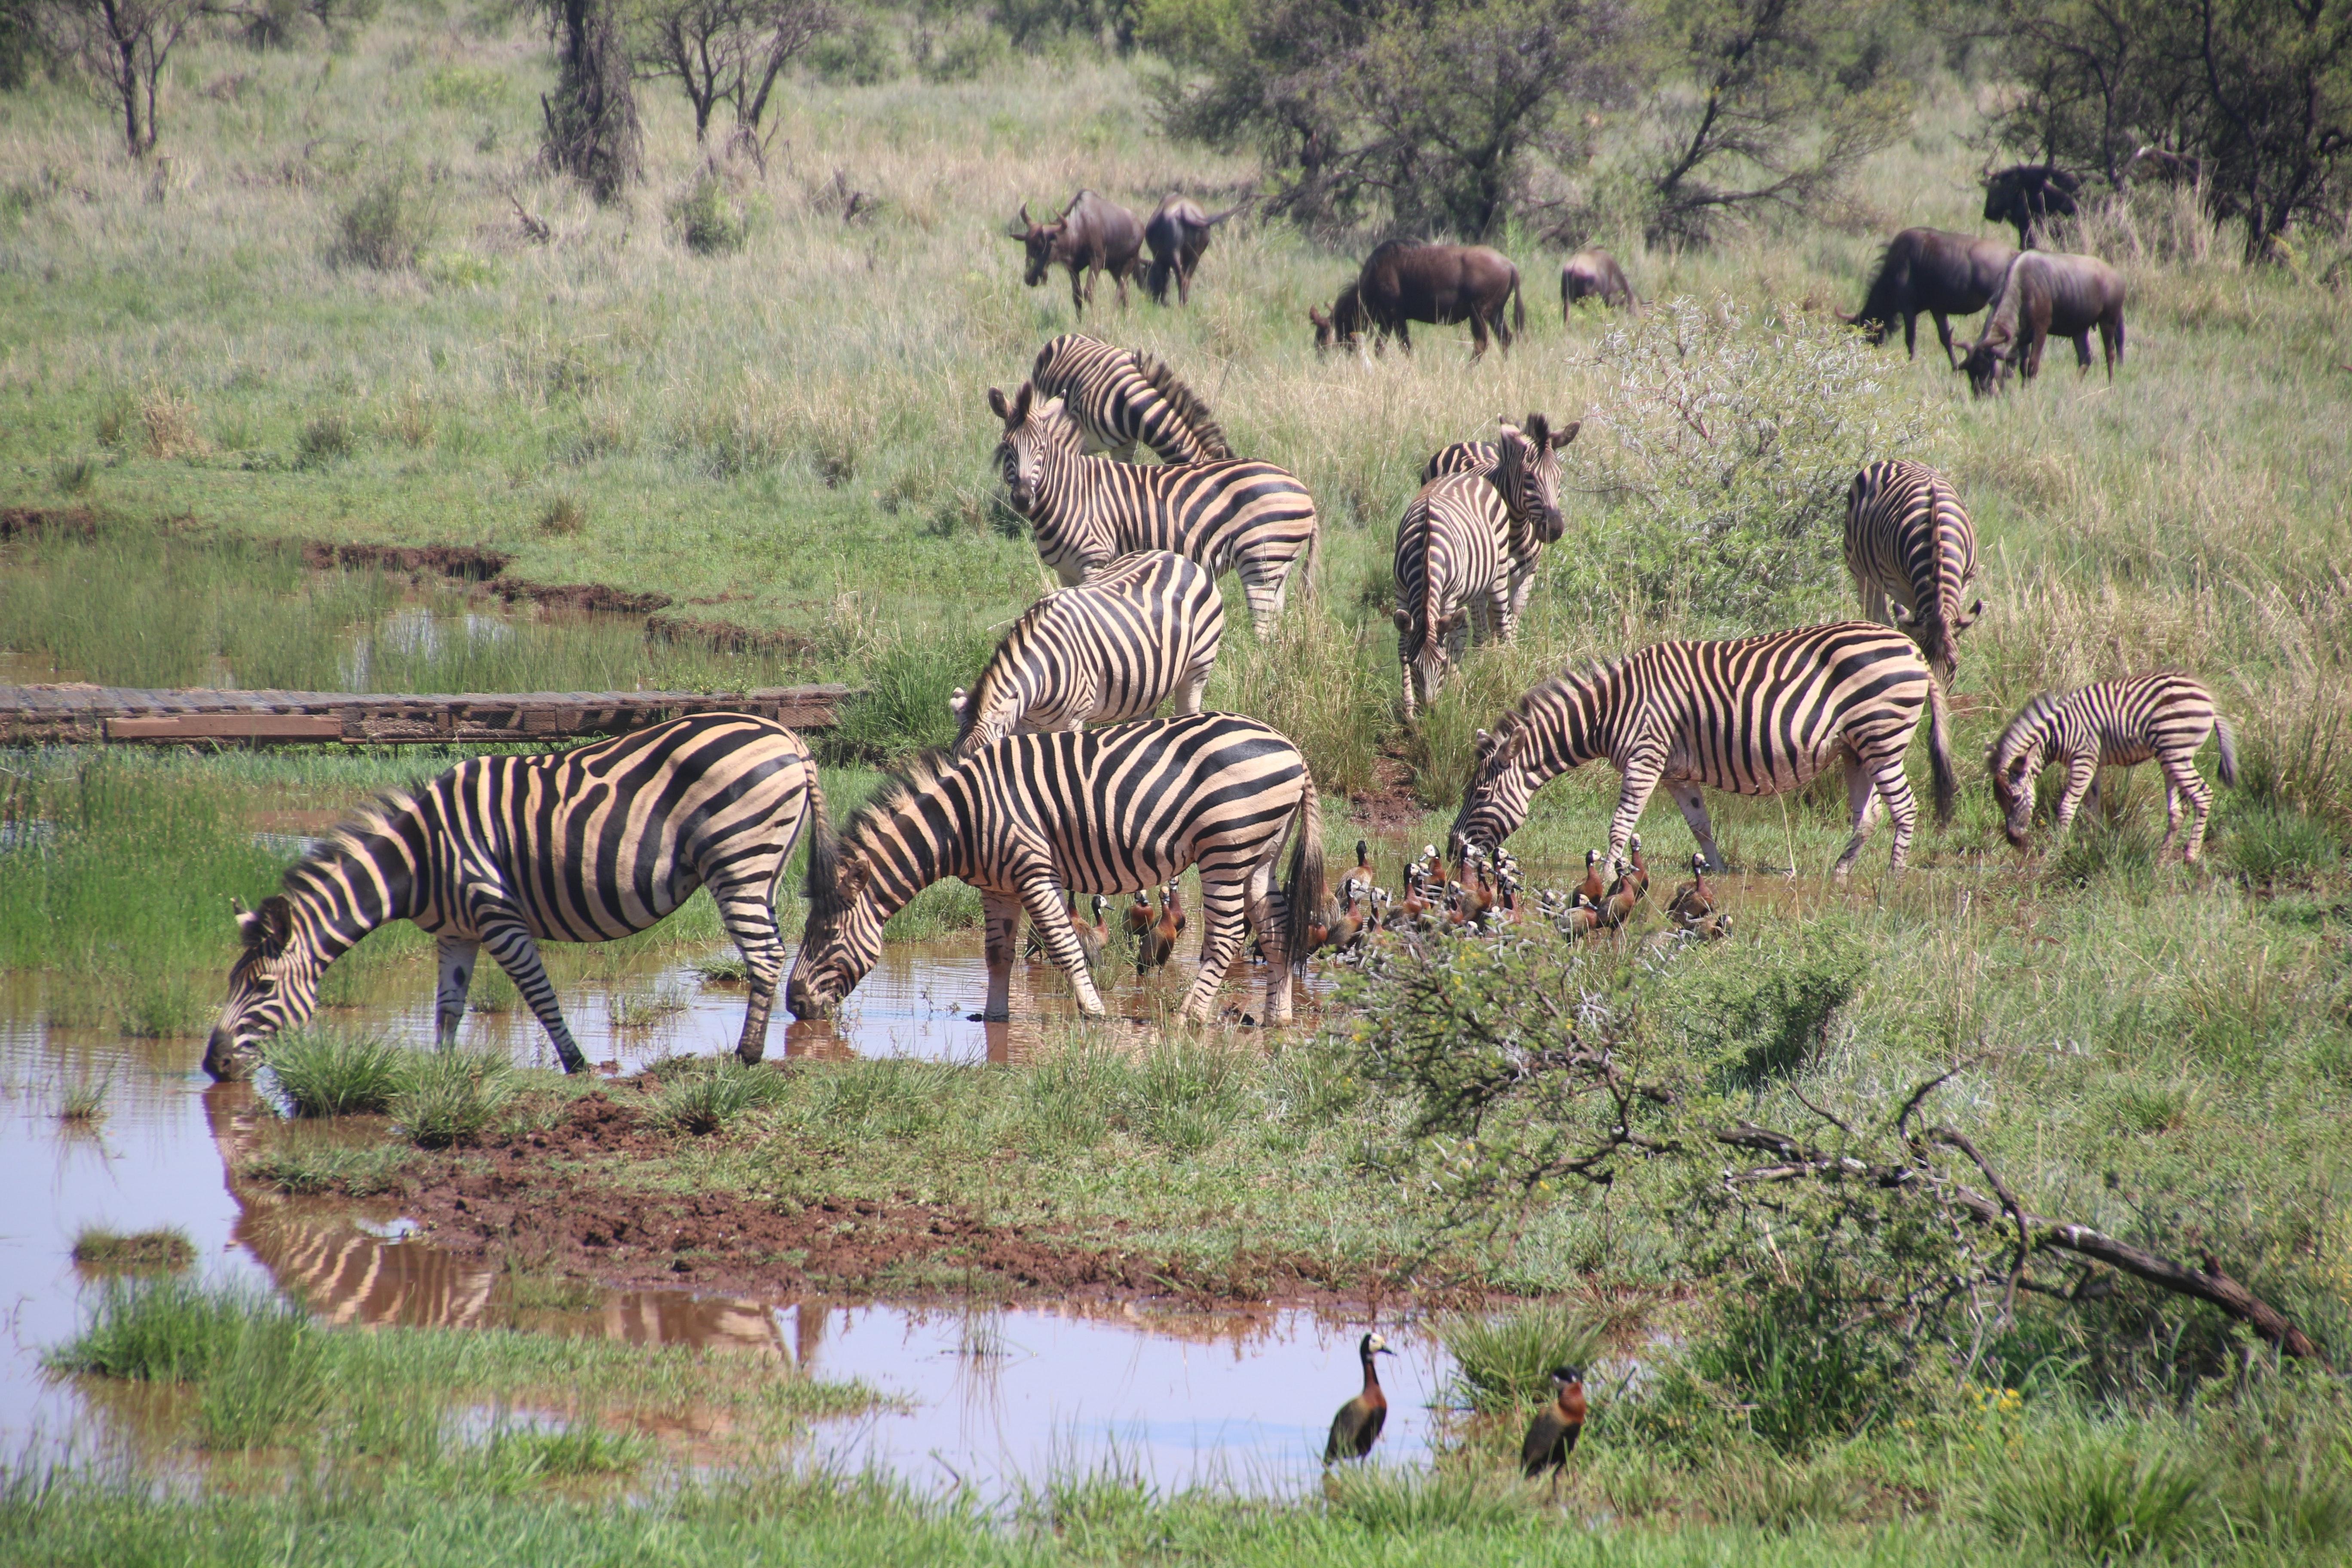 Herd of zebras on grass field photo